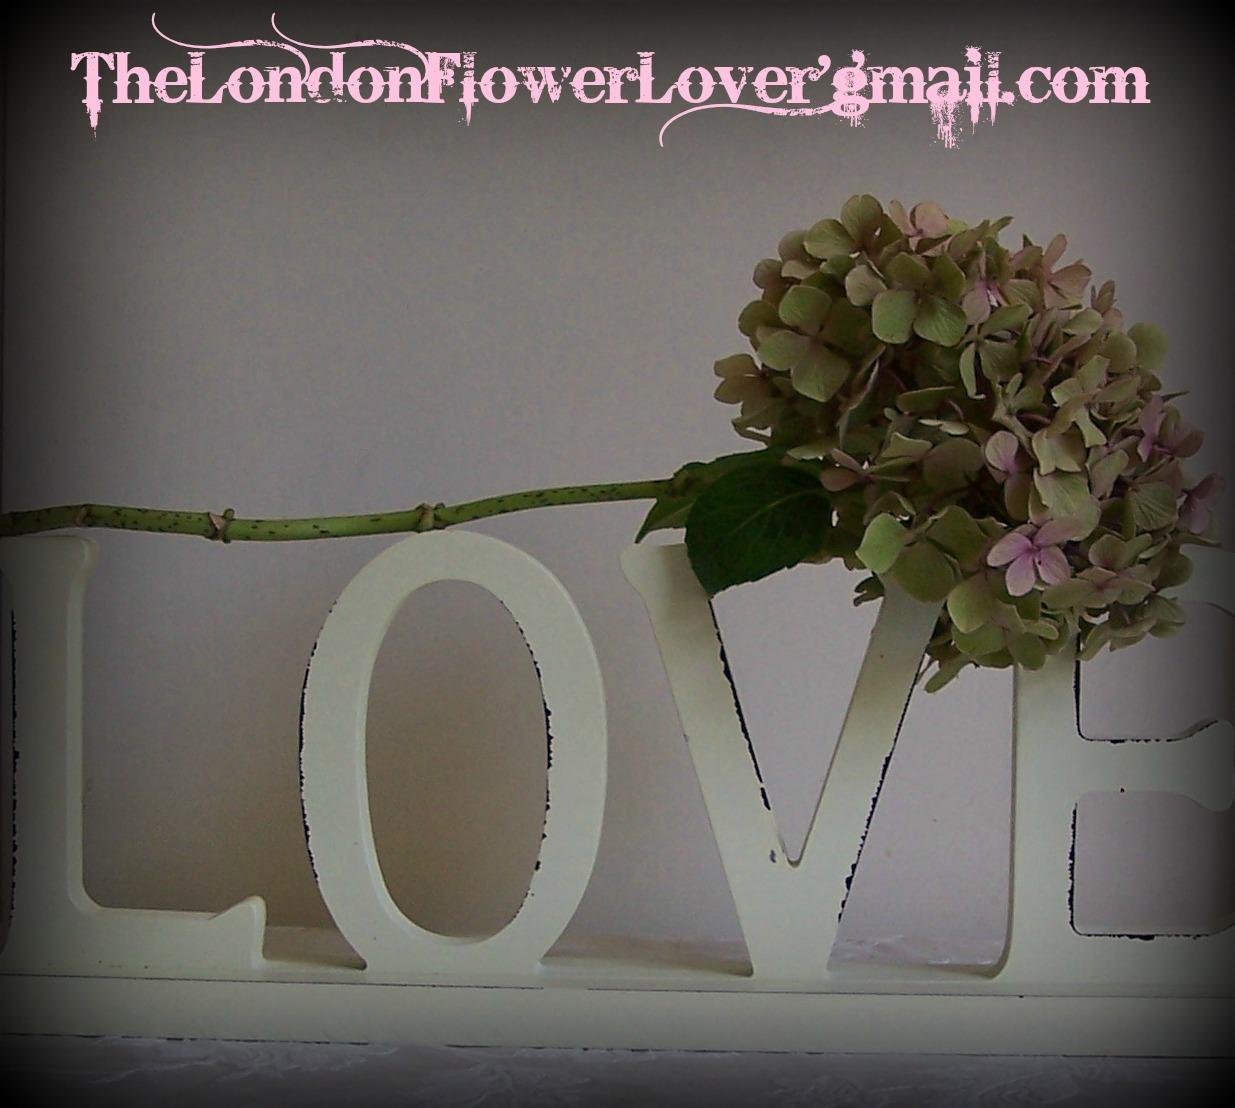 Why do women love flowers